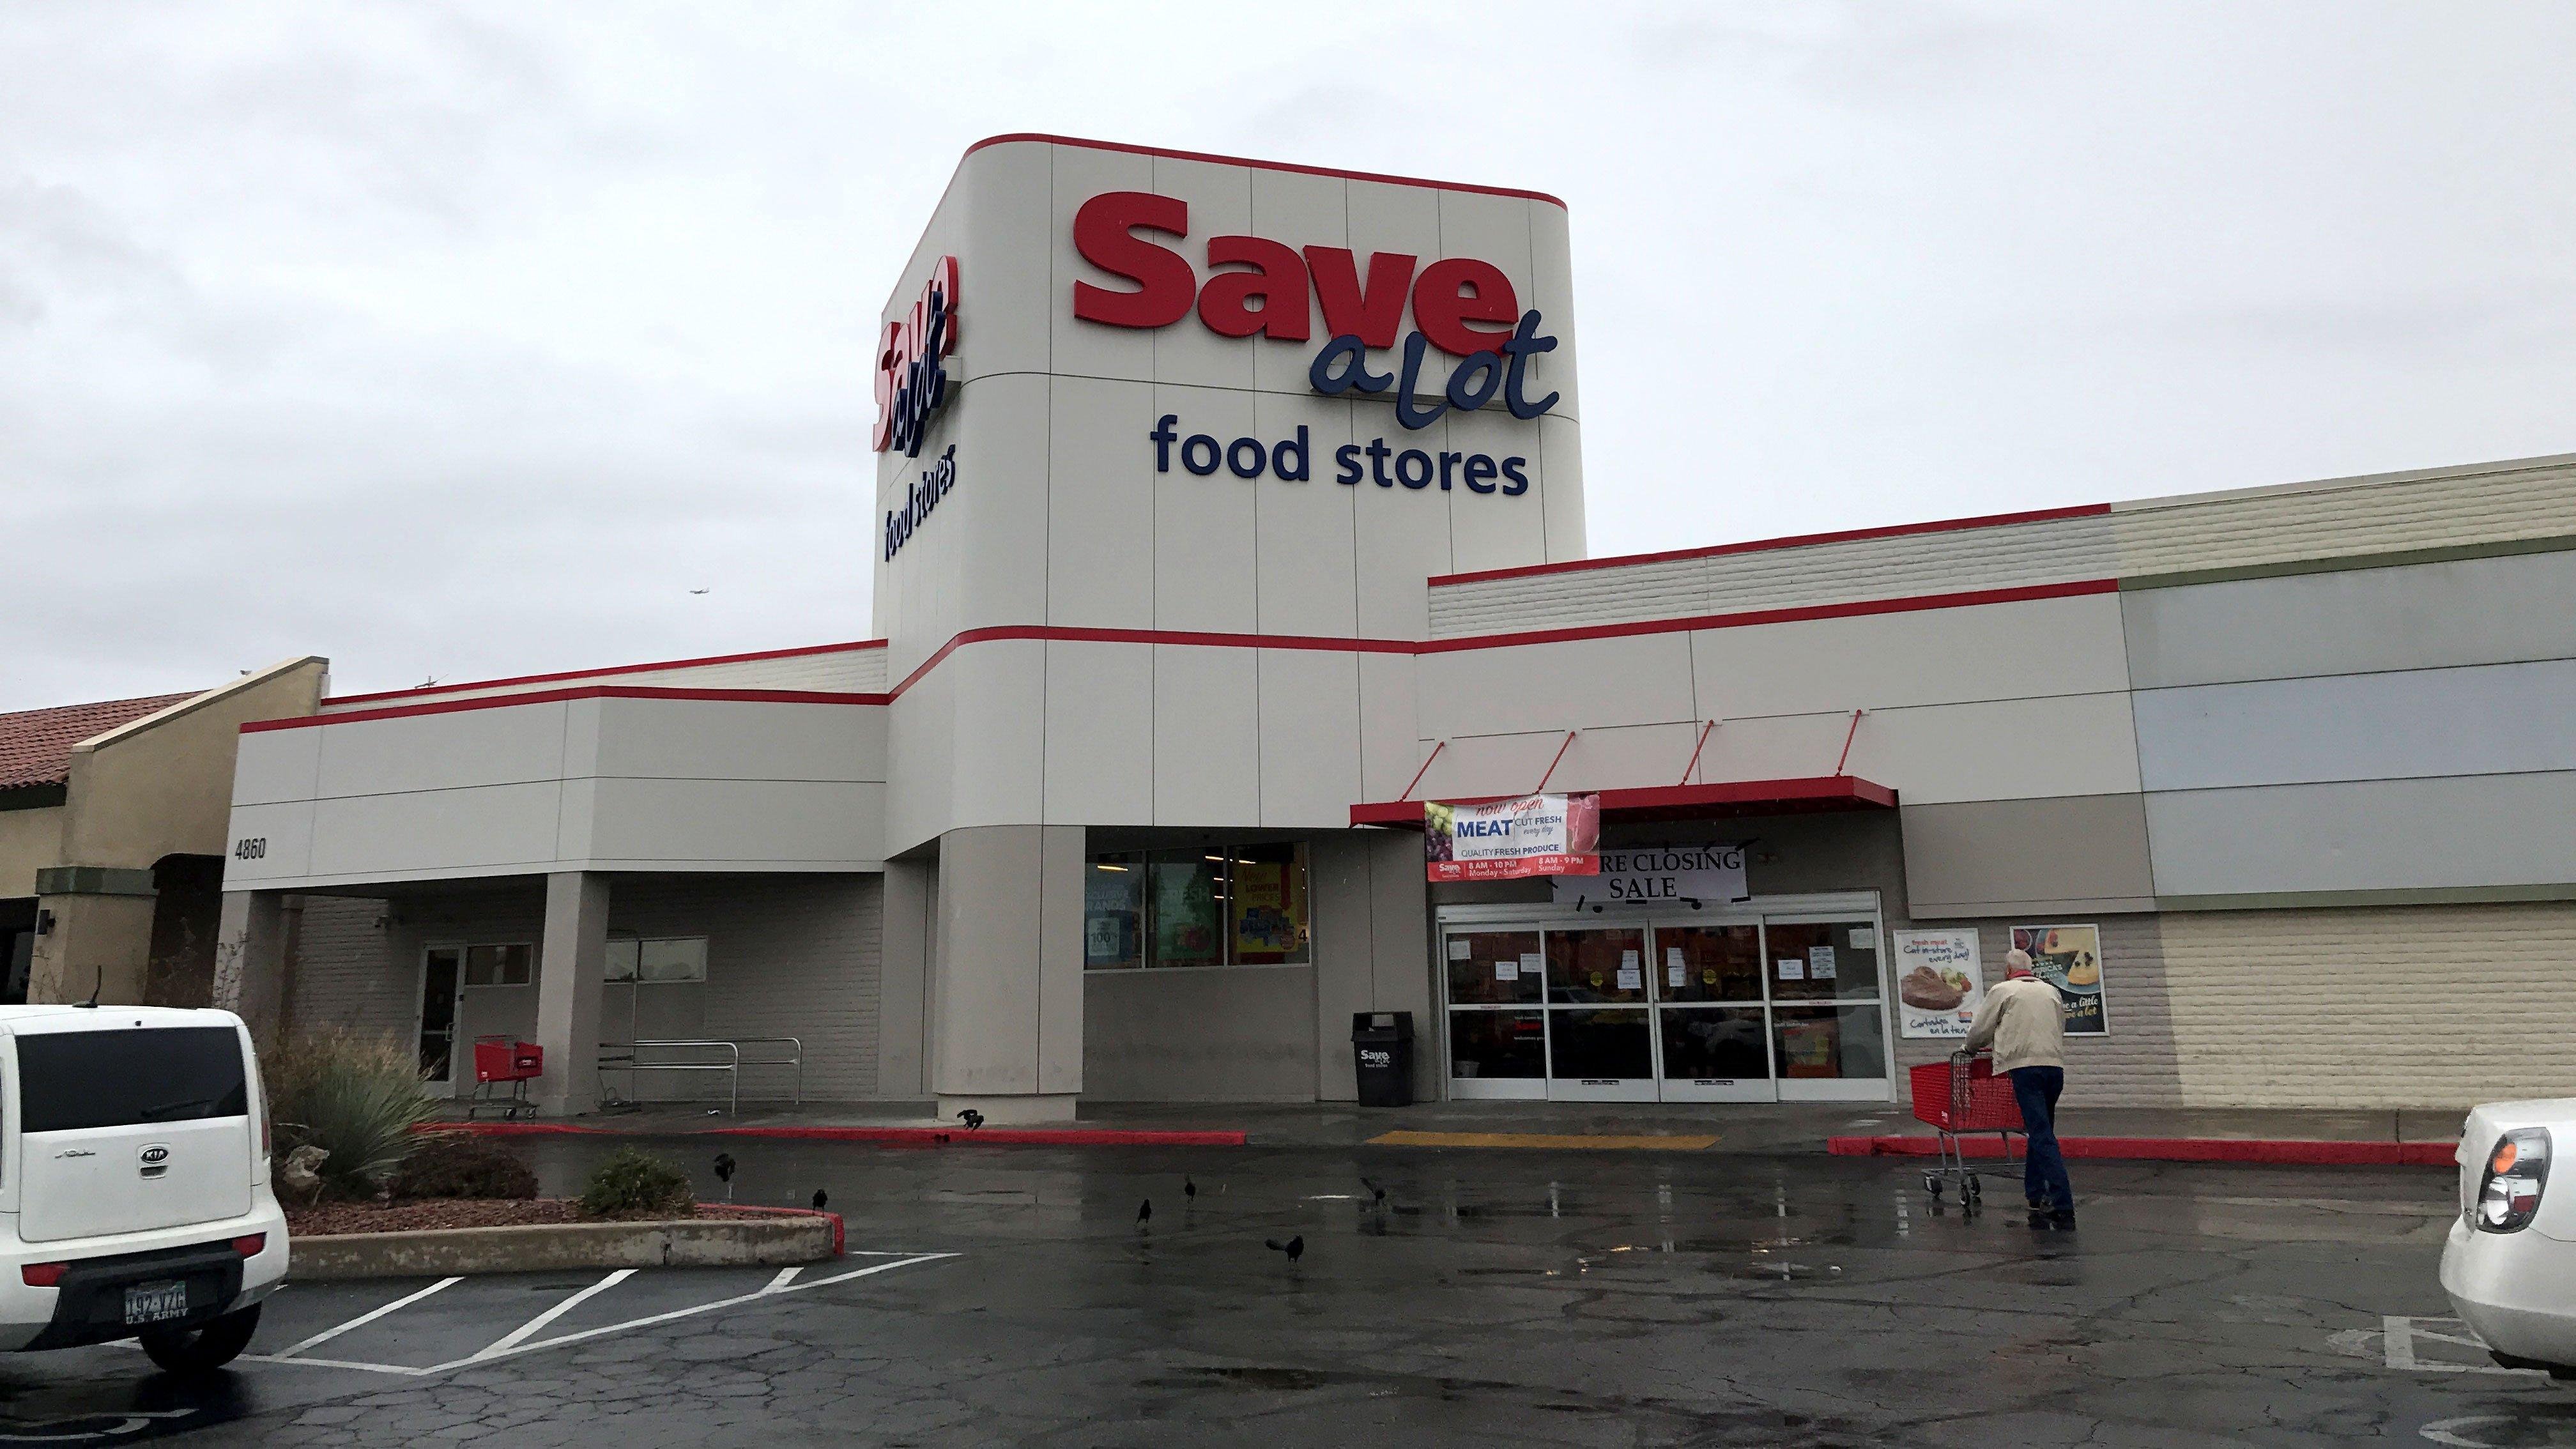 A shopper walks into a Save-A-Lot store on Jan. 20, 2017. (Gai Phanalasy/FOX5)